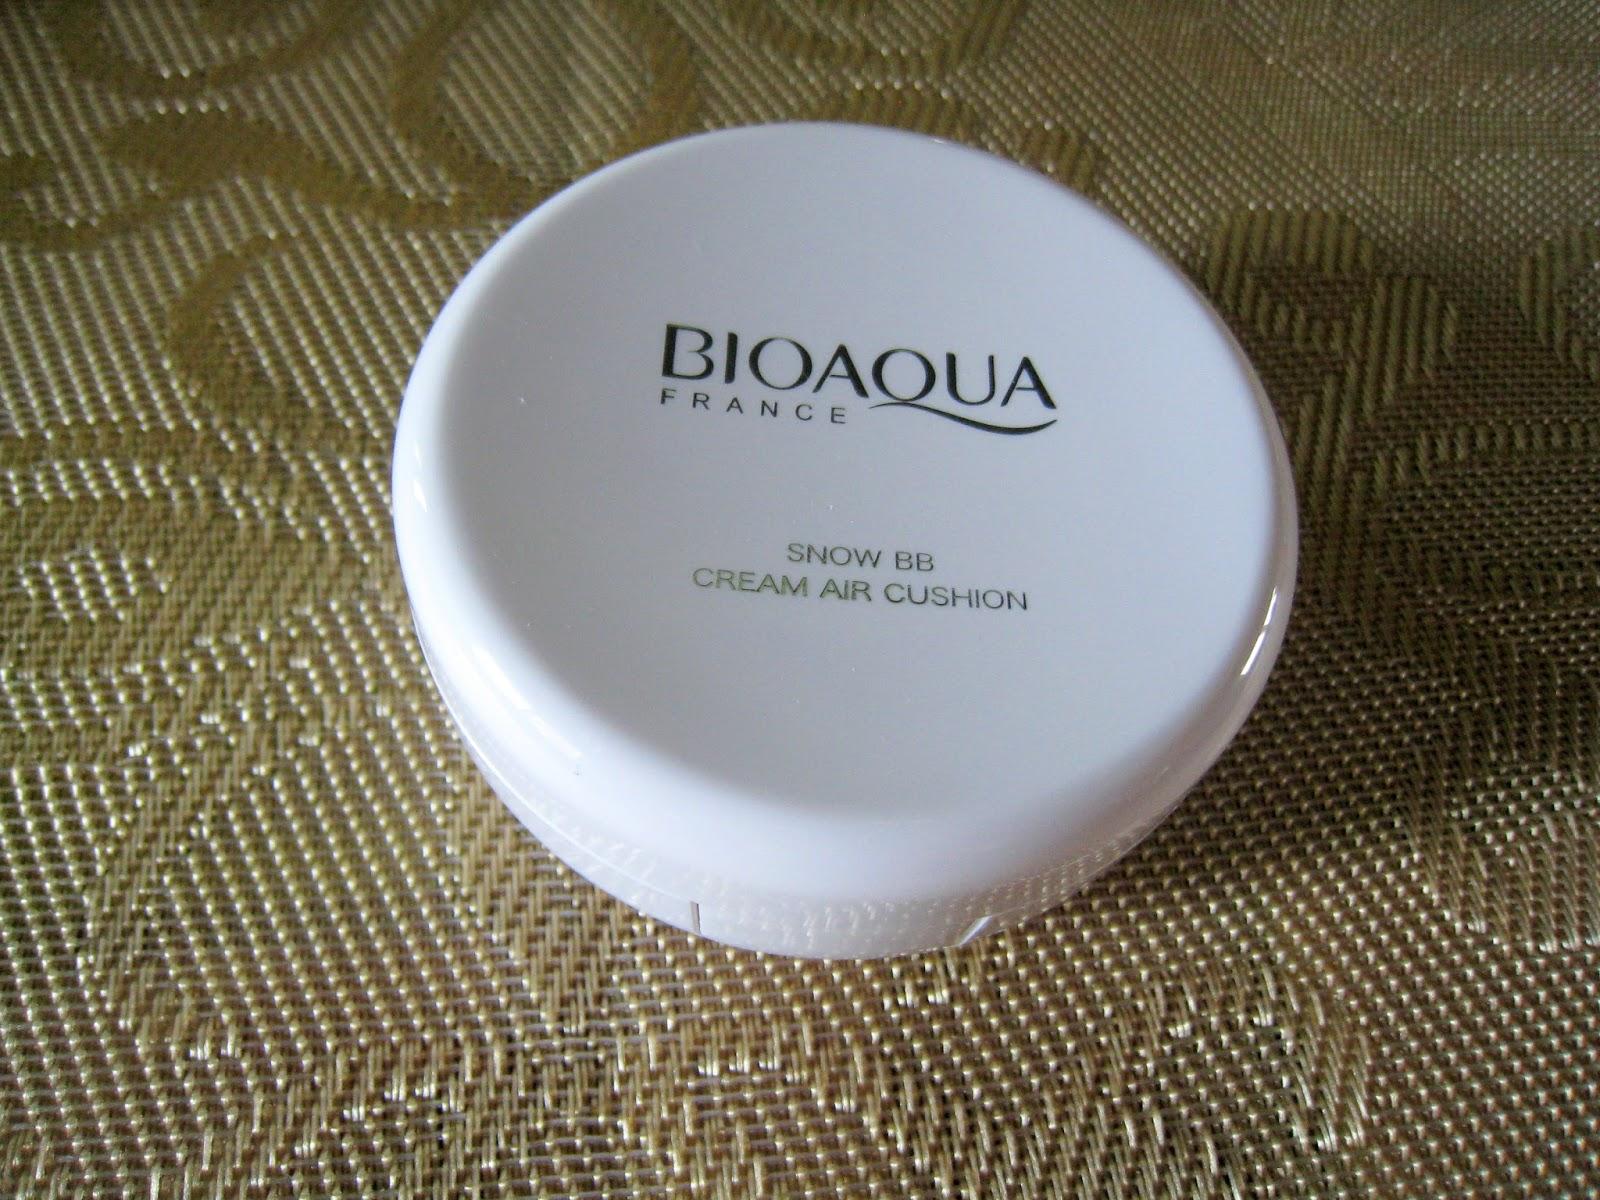 Bioaqua Air Cushion Bb Cream Moisturizing Makeup Review By Elgr Nail Bio Aqua Aircusion Im Not Sure Why It Says France Definitely Came From China